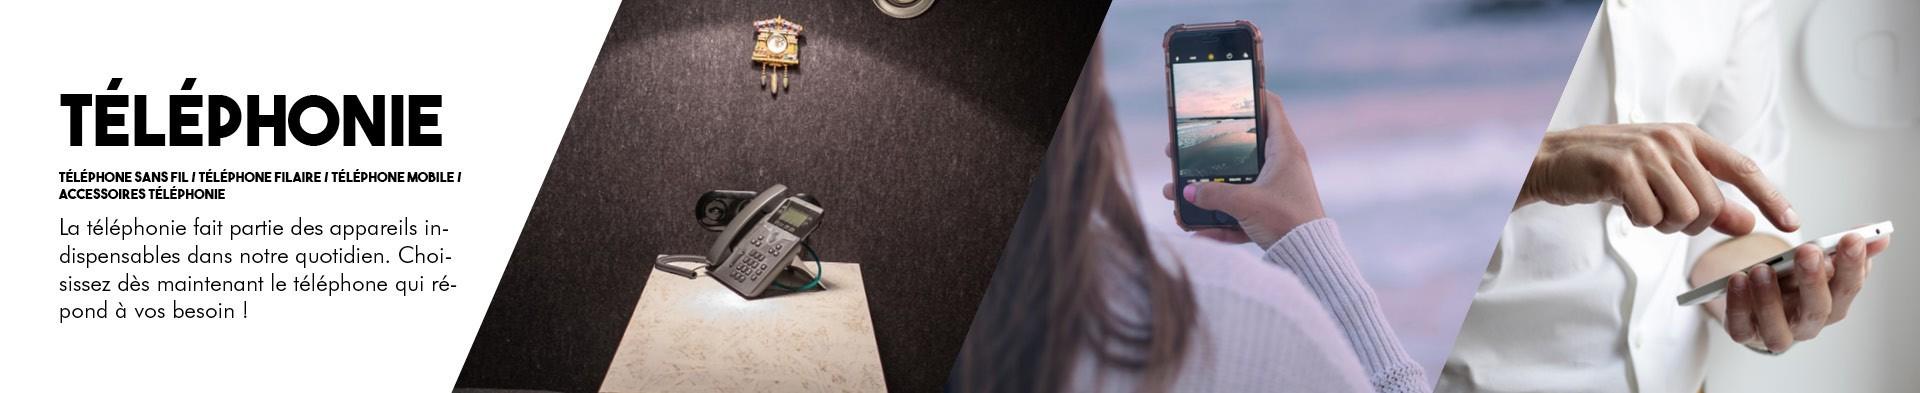 Téléphonie | BlackPanther.fr